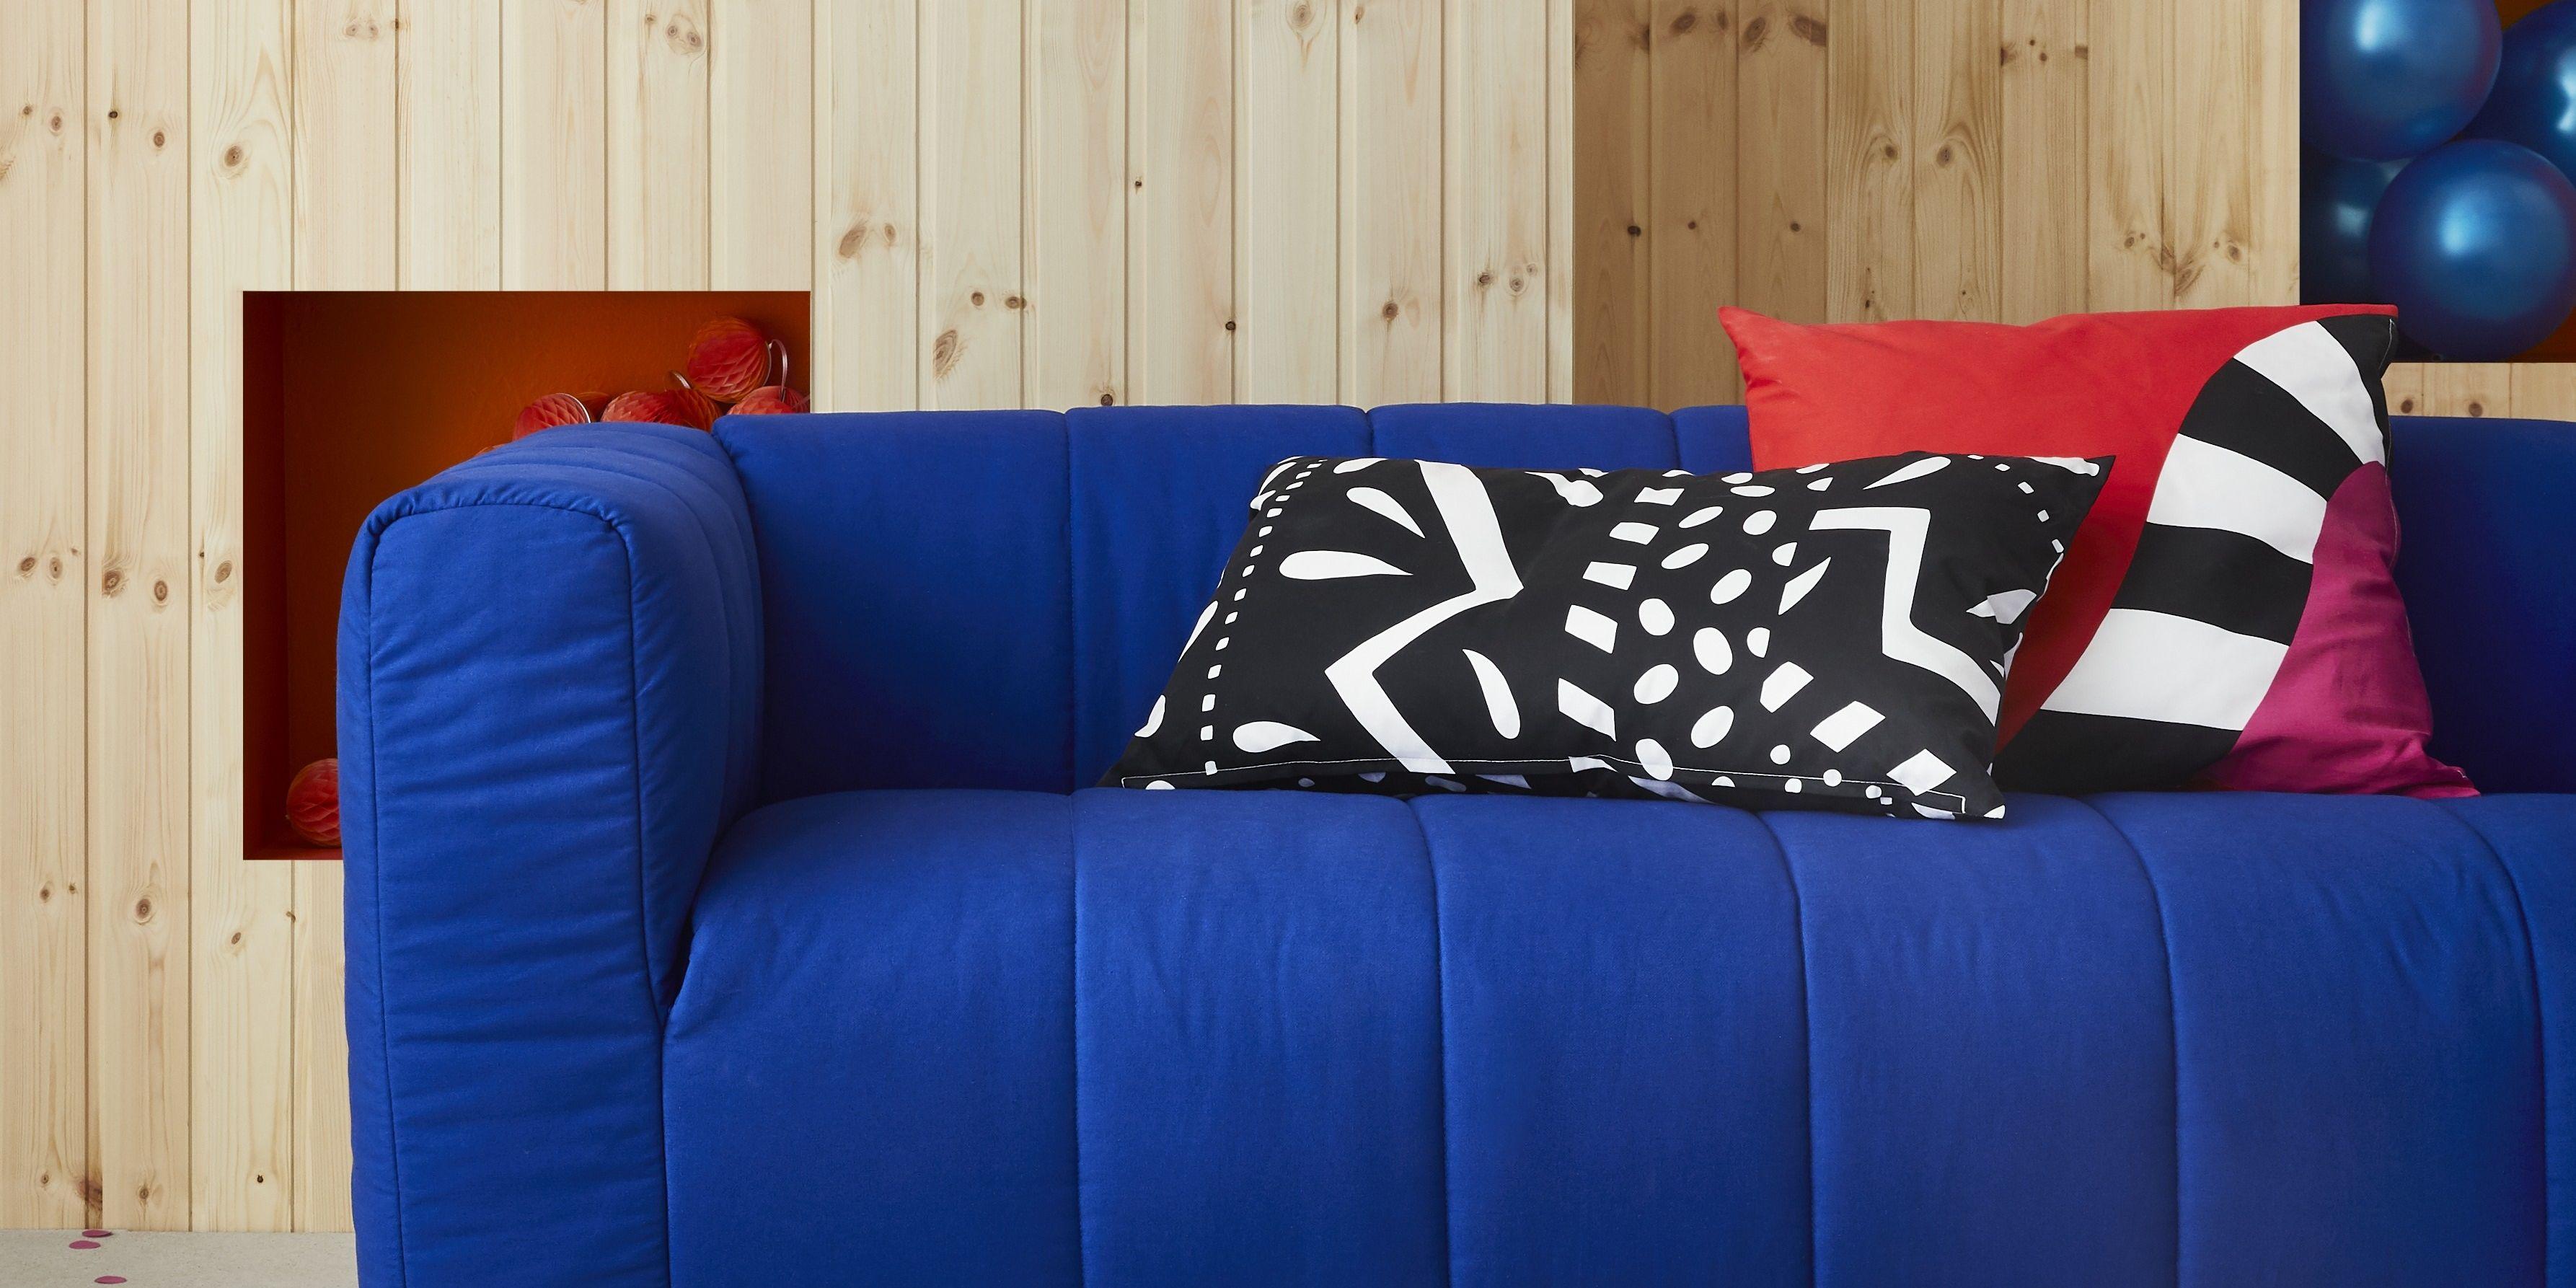 Special Ikea collection called GRATULERA celebrates 75 years of Ikea